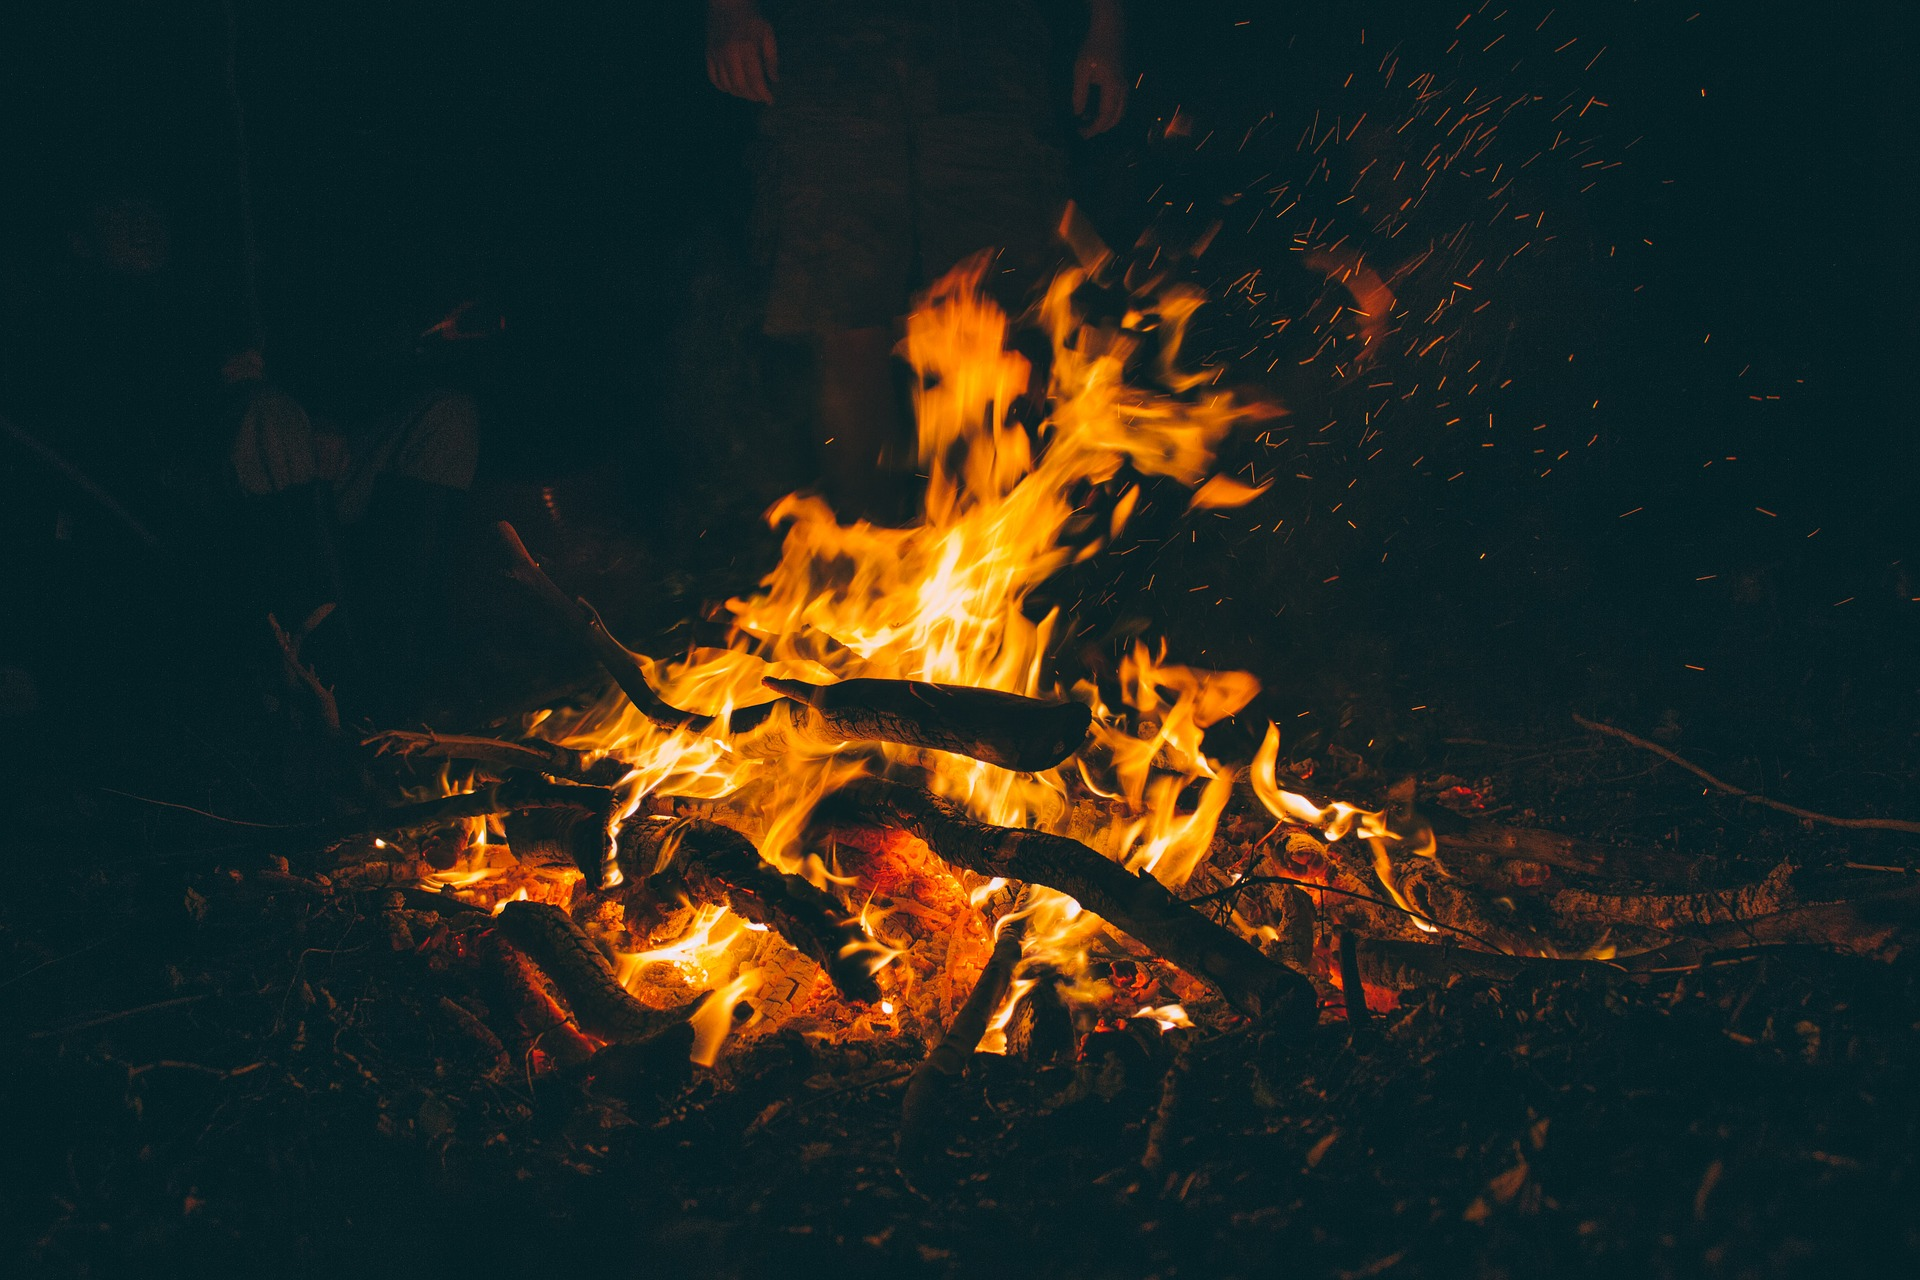 bonfire-1835829_1920_1559395622609.jpg